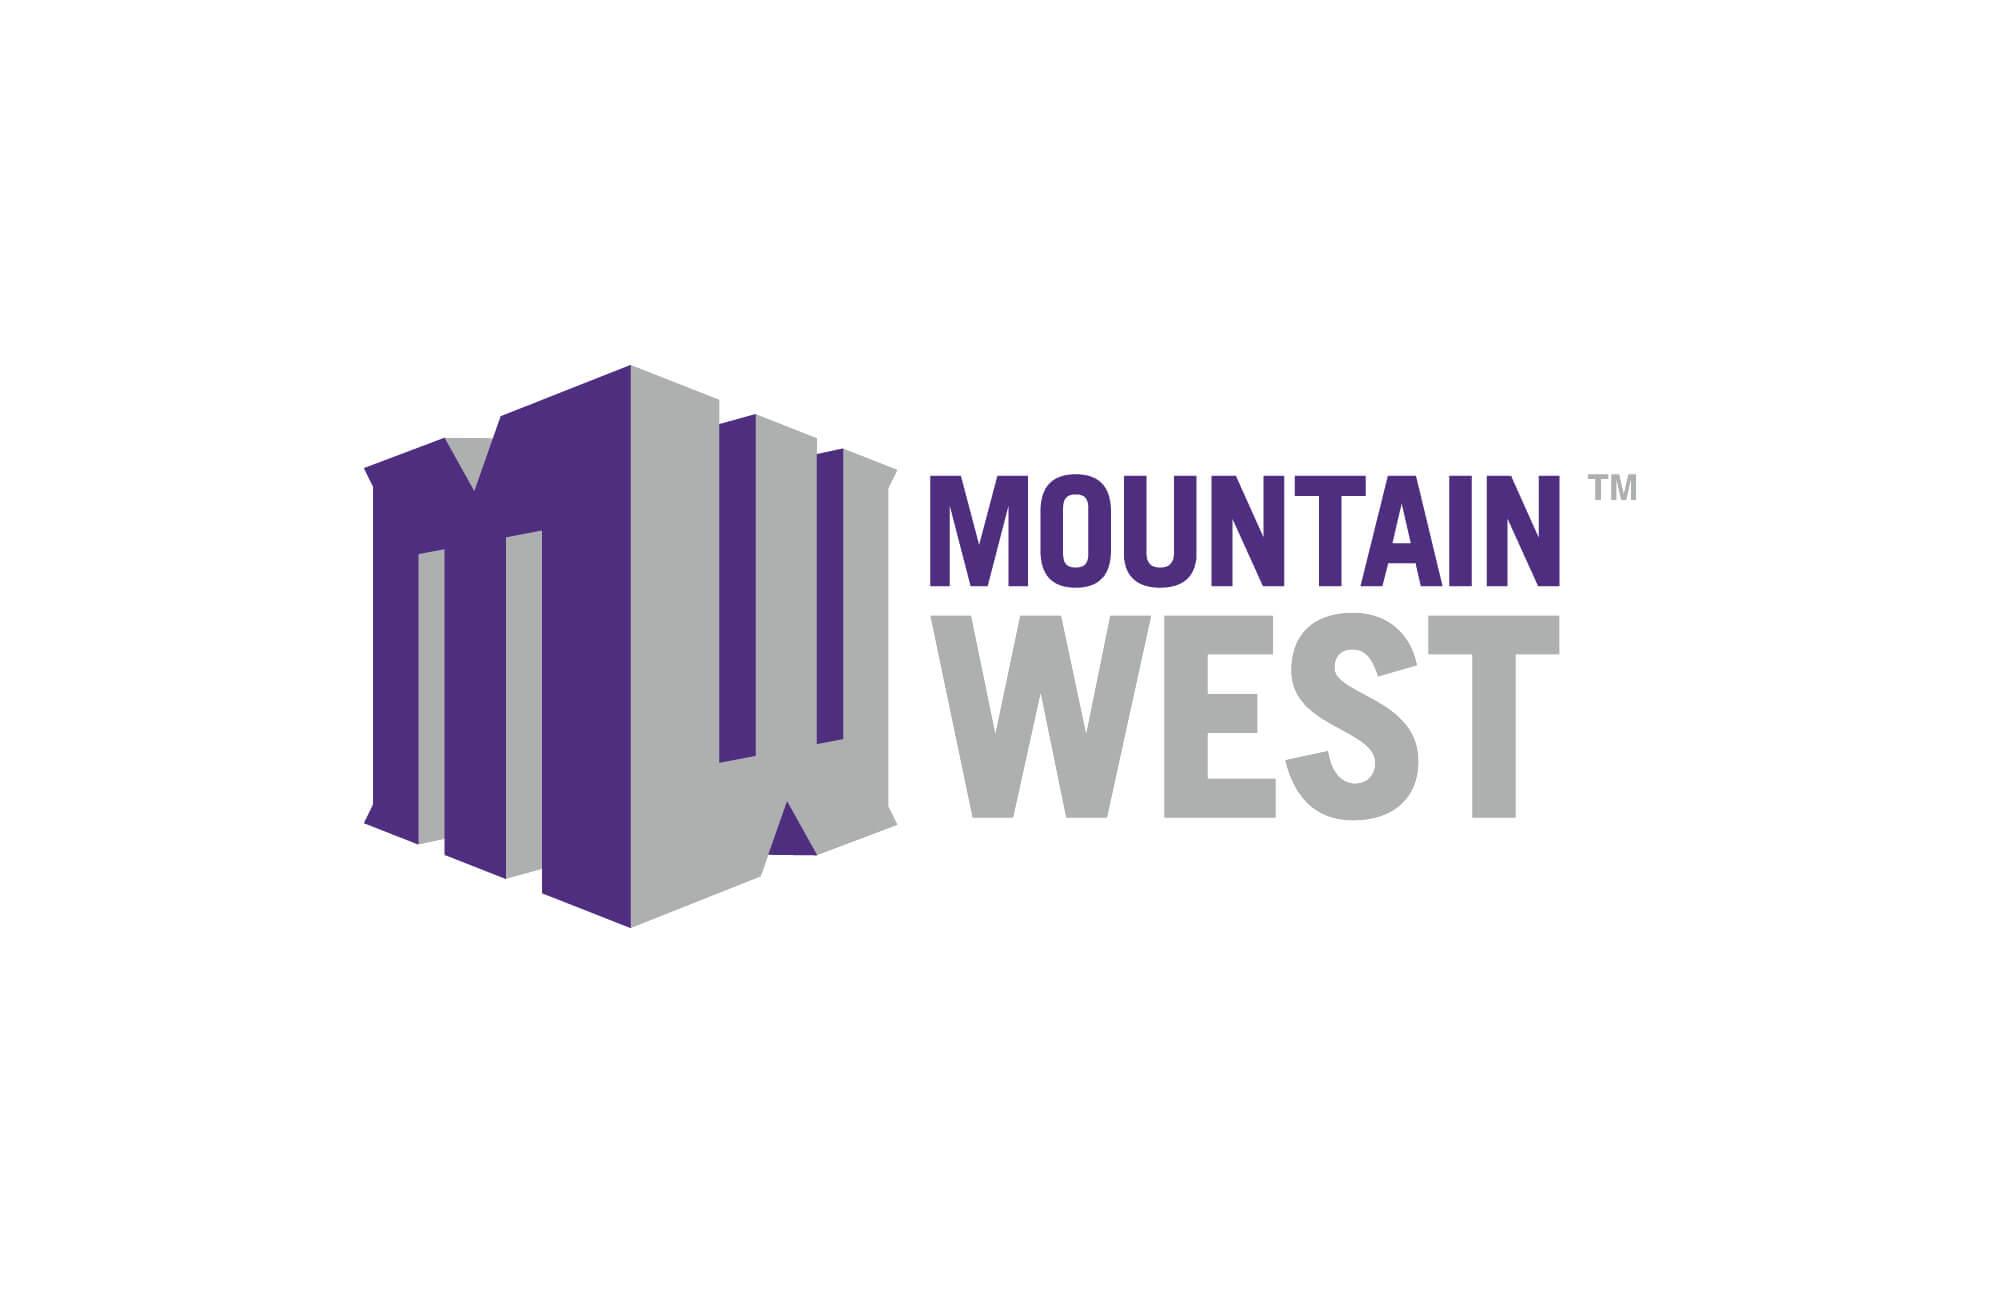 1MW-Wordmark-Logo_White_Bg